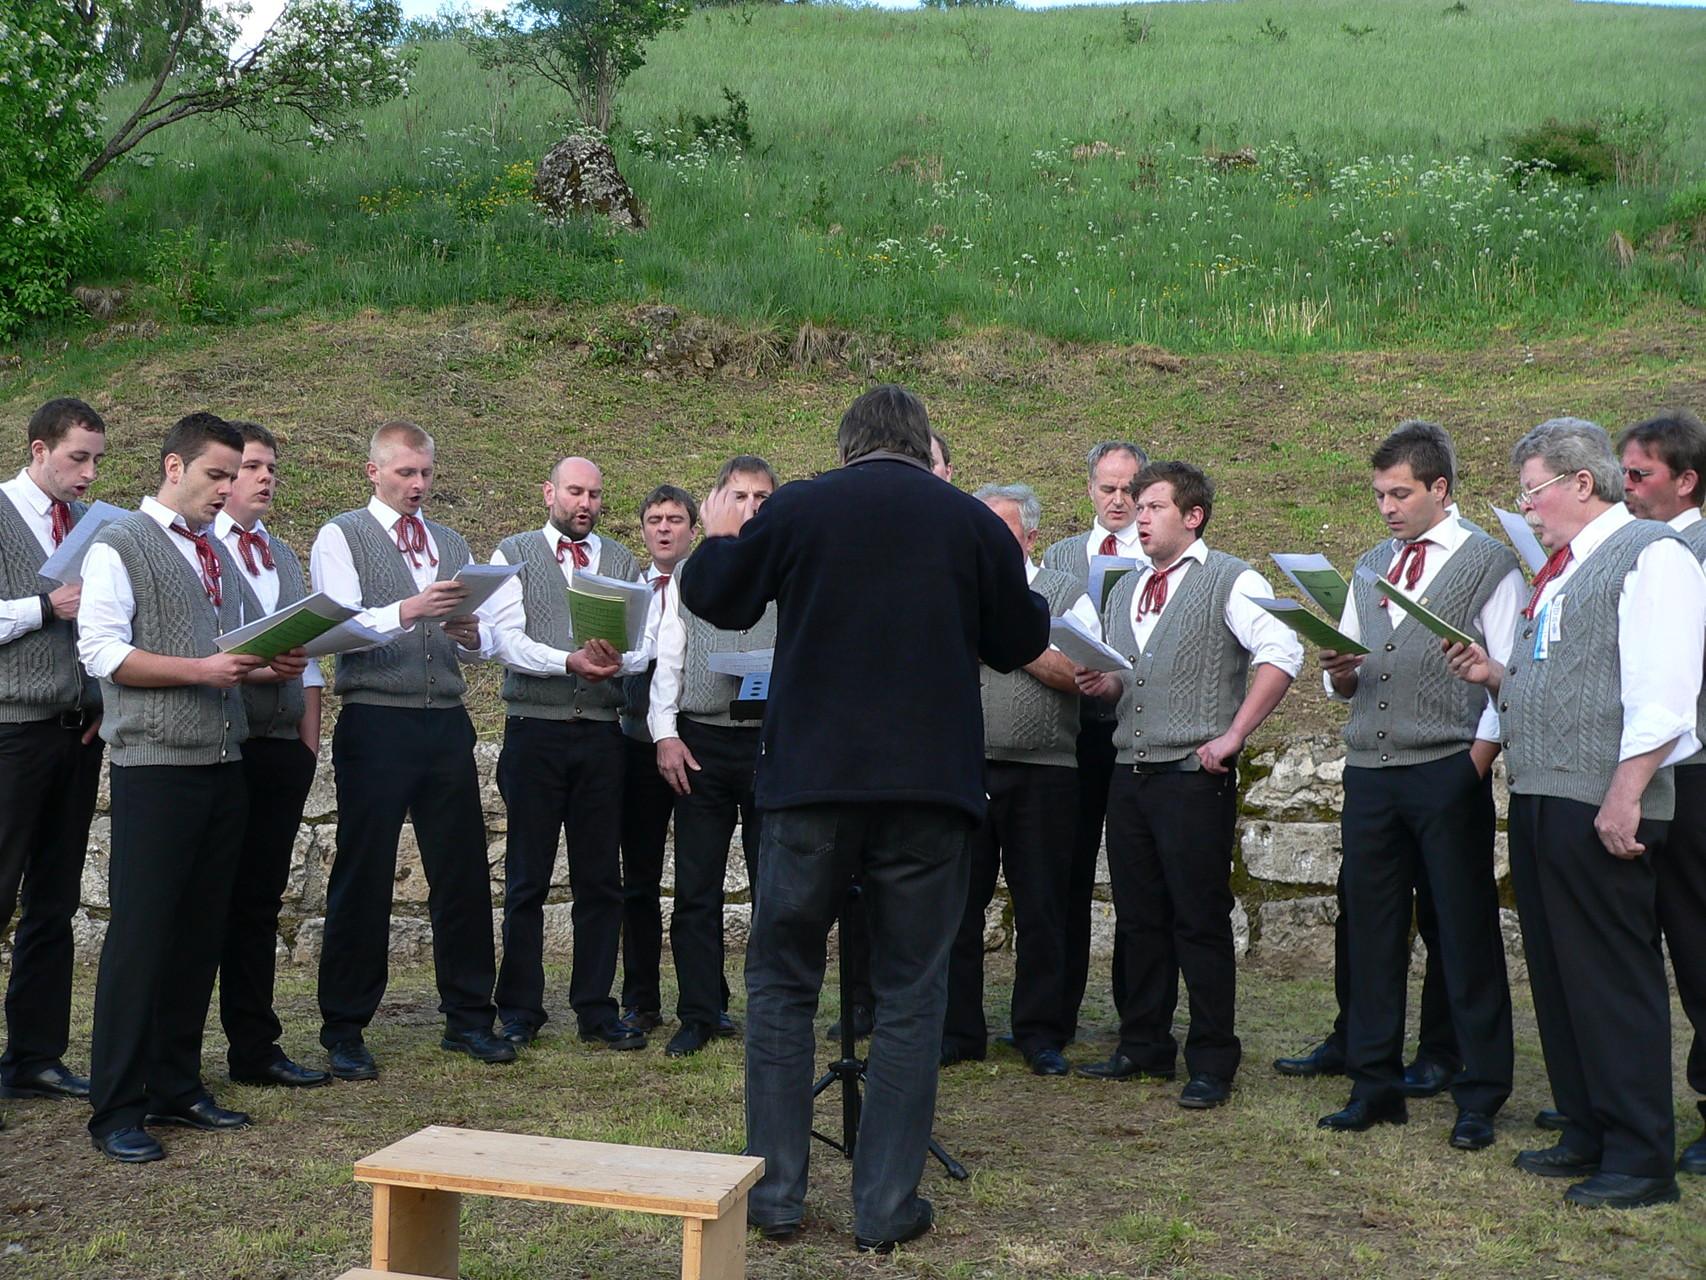 Sängerbund Thalheim